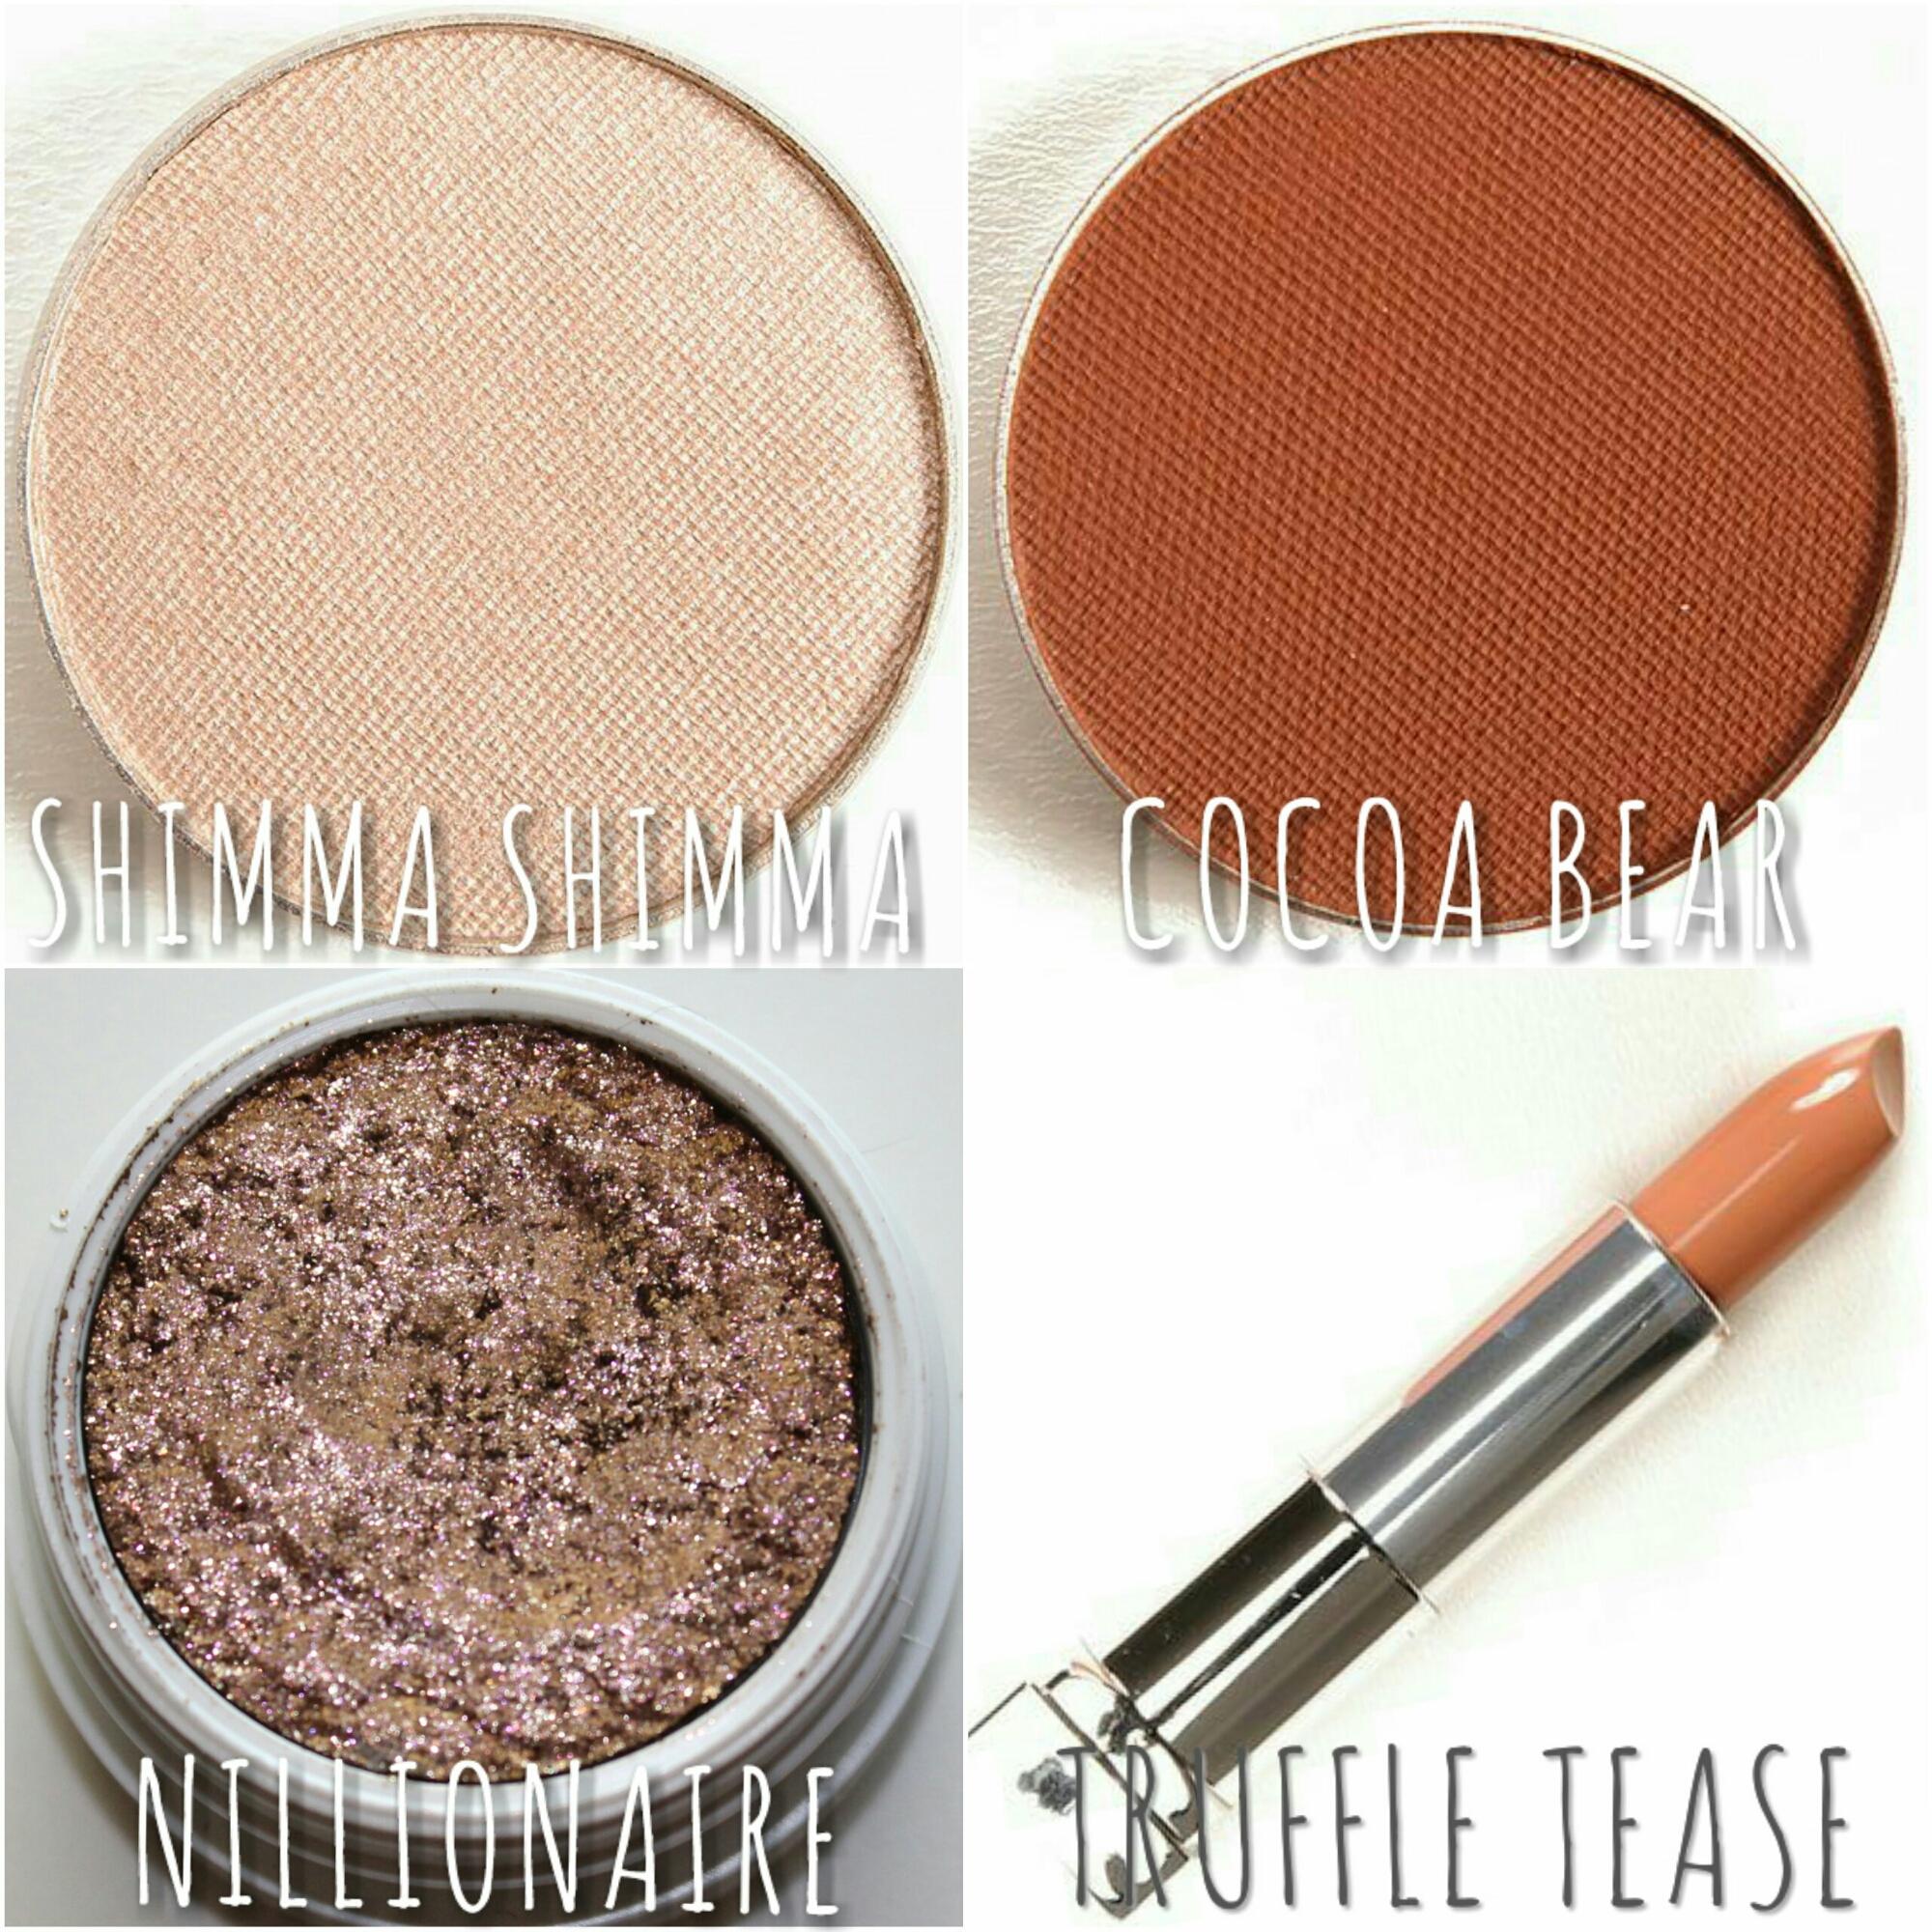 MakeupGeek Cocoa Bear MakeupGeek Shimma Shimma ColourPop Nillionaire Maybelline Truffle Tease MOTD